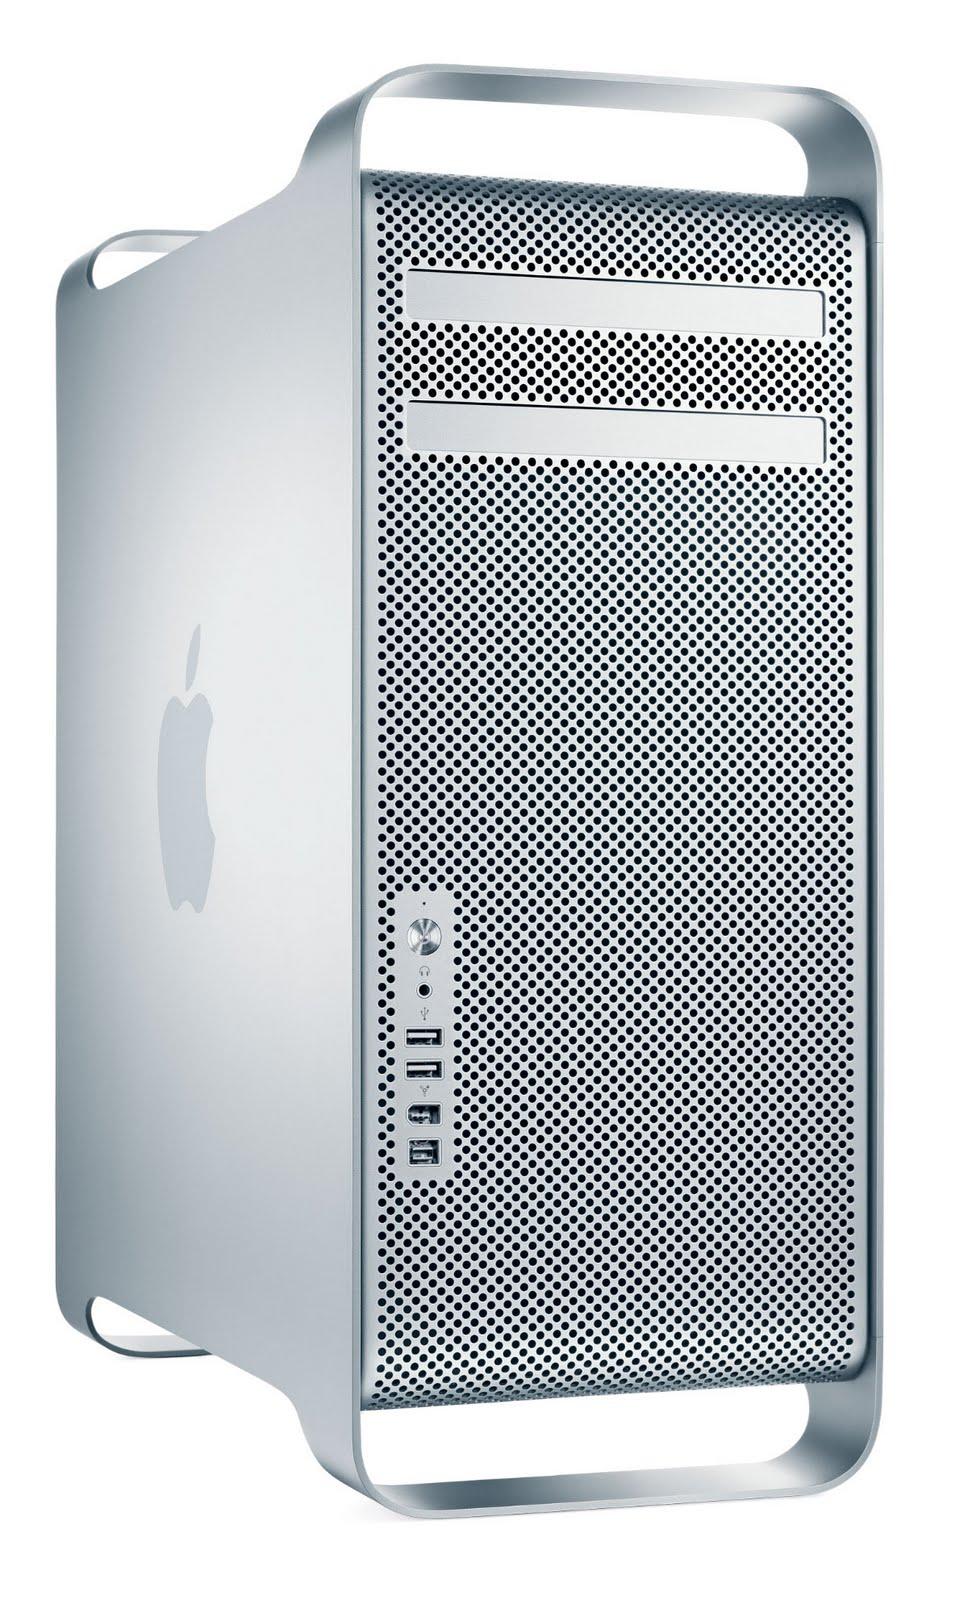 apple mac pro computer technical specs photography amp technology hub